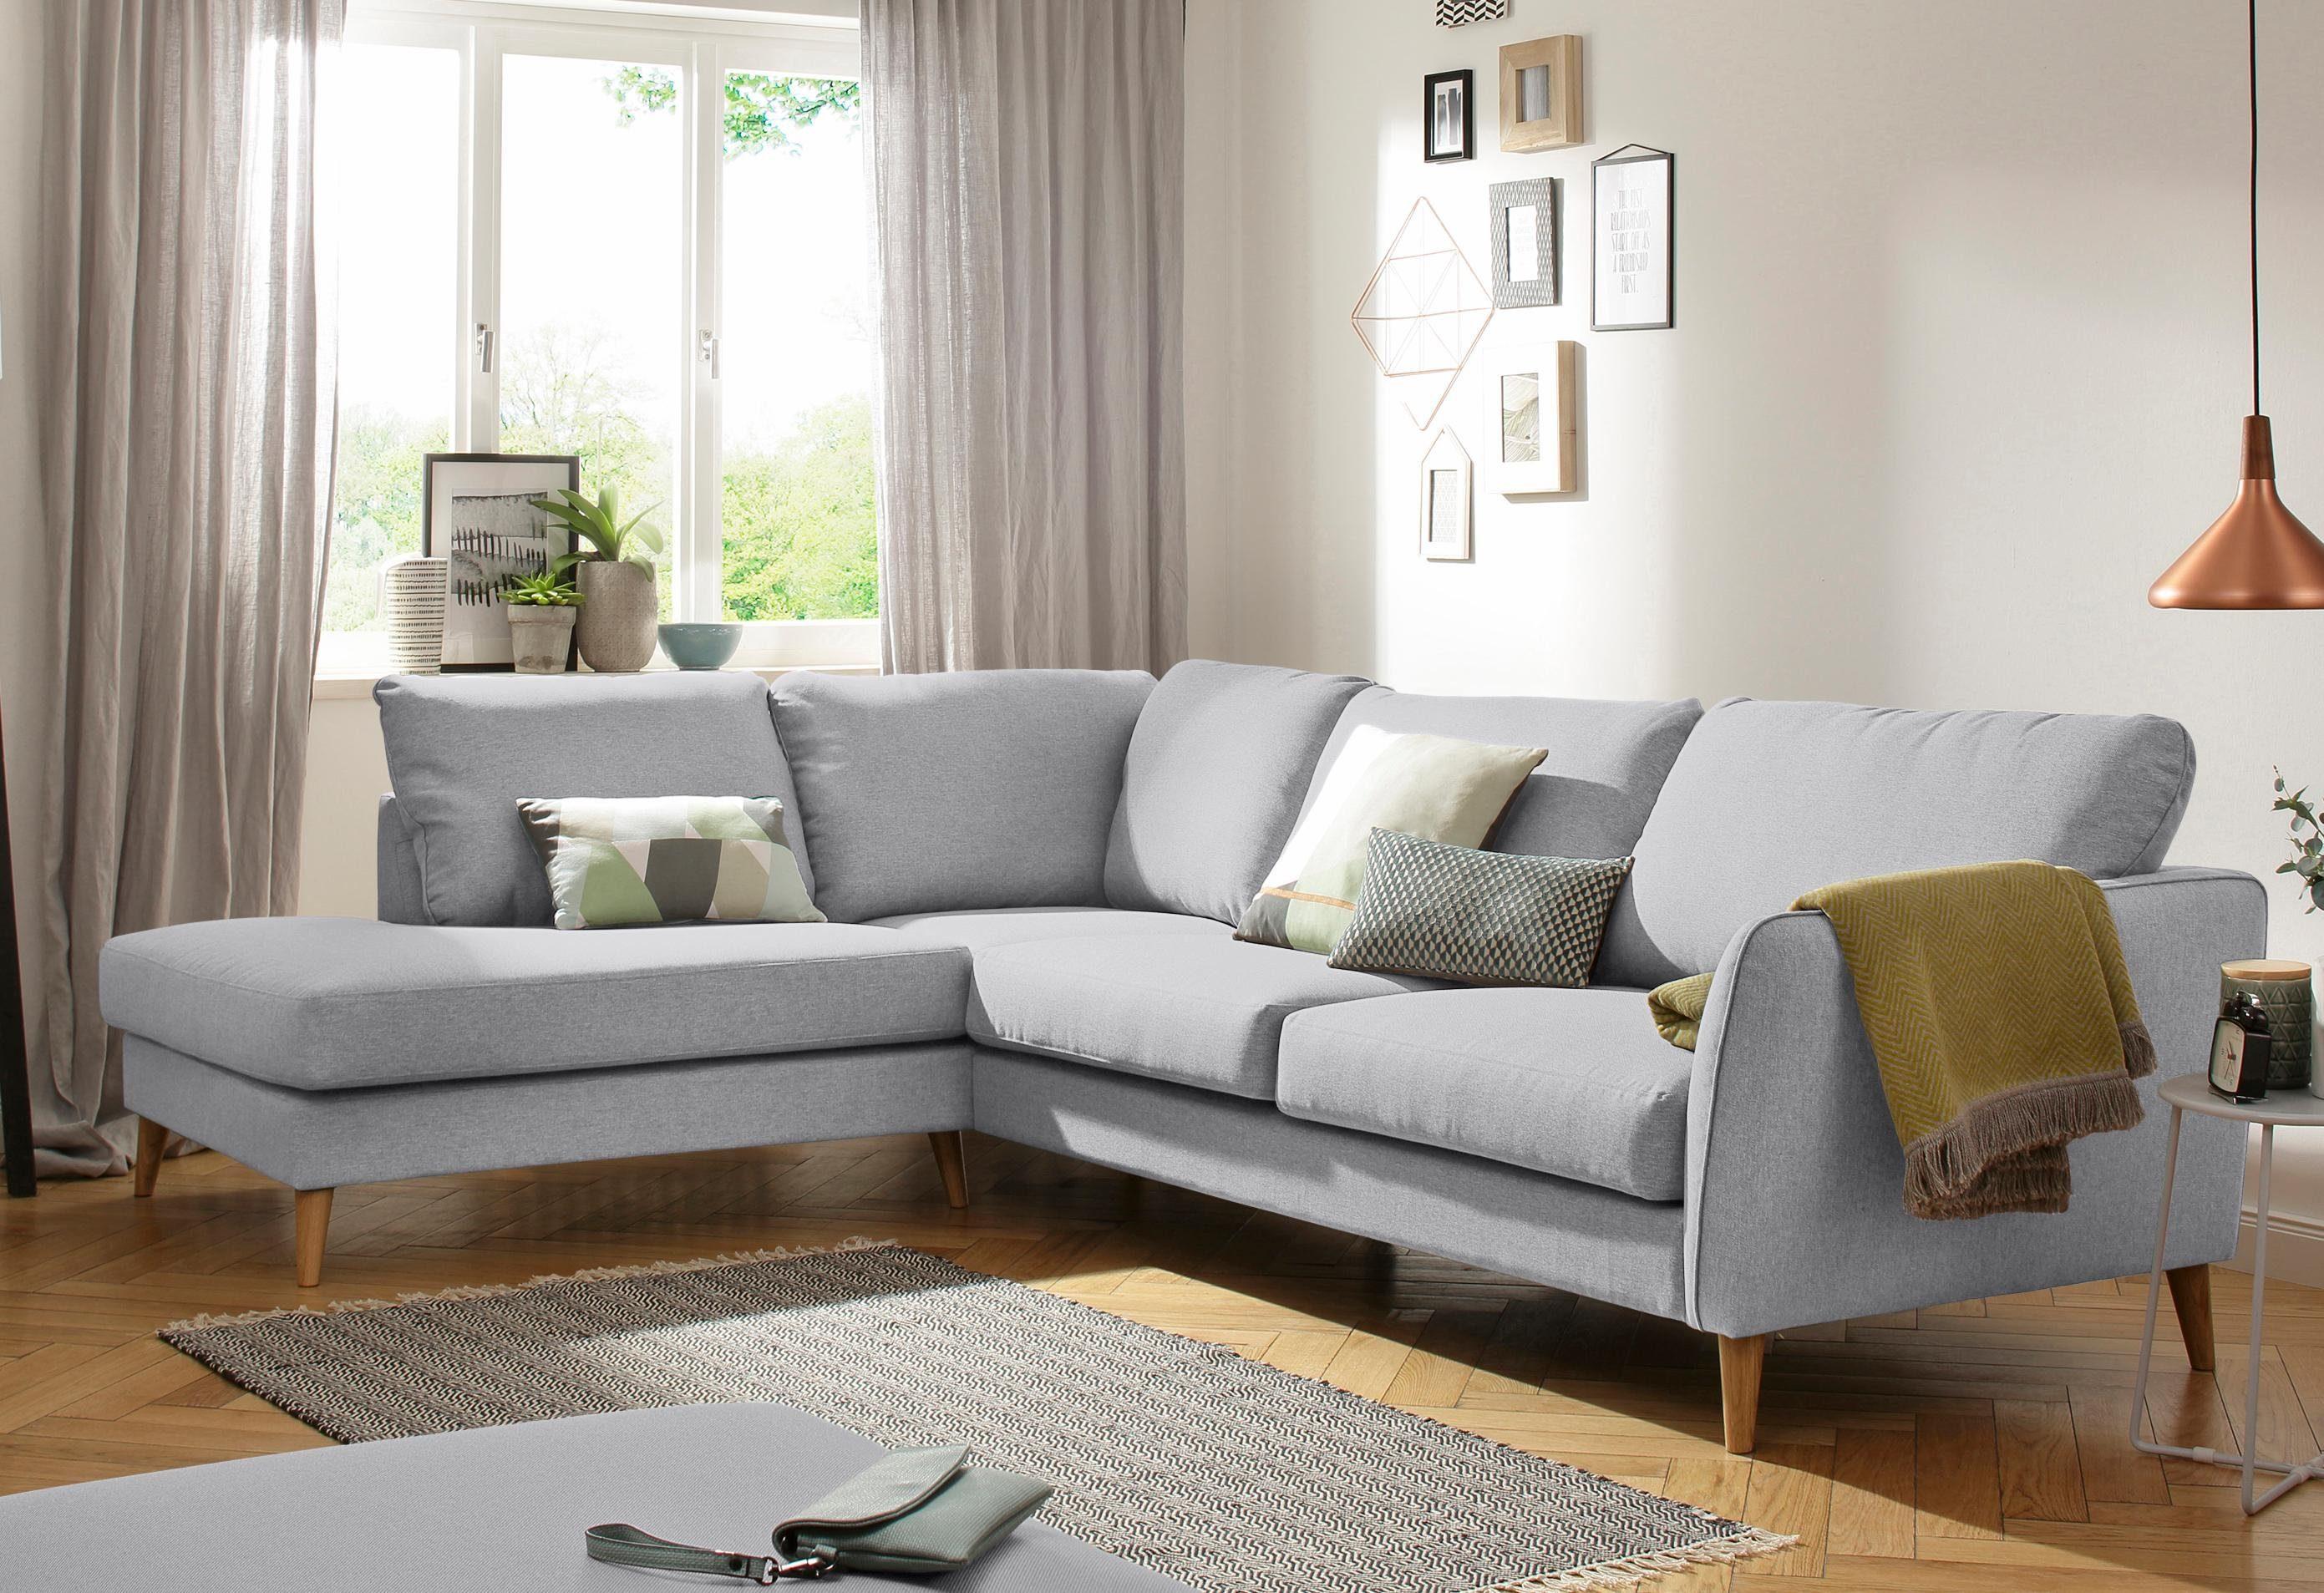 Skandinavische Sofas Modell : Skandinavische sofas beliebt sofa design atemberaubend sofabett